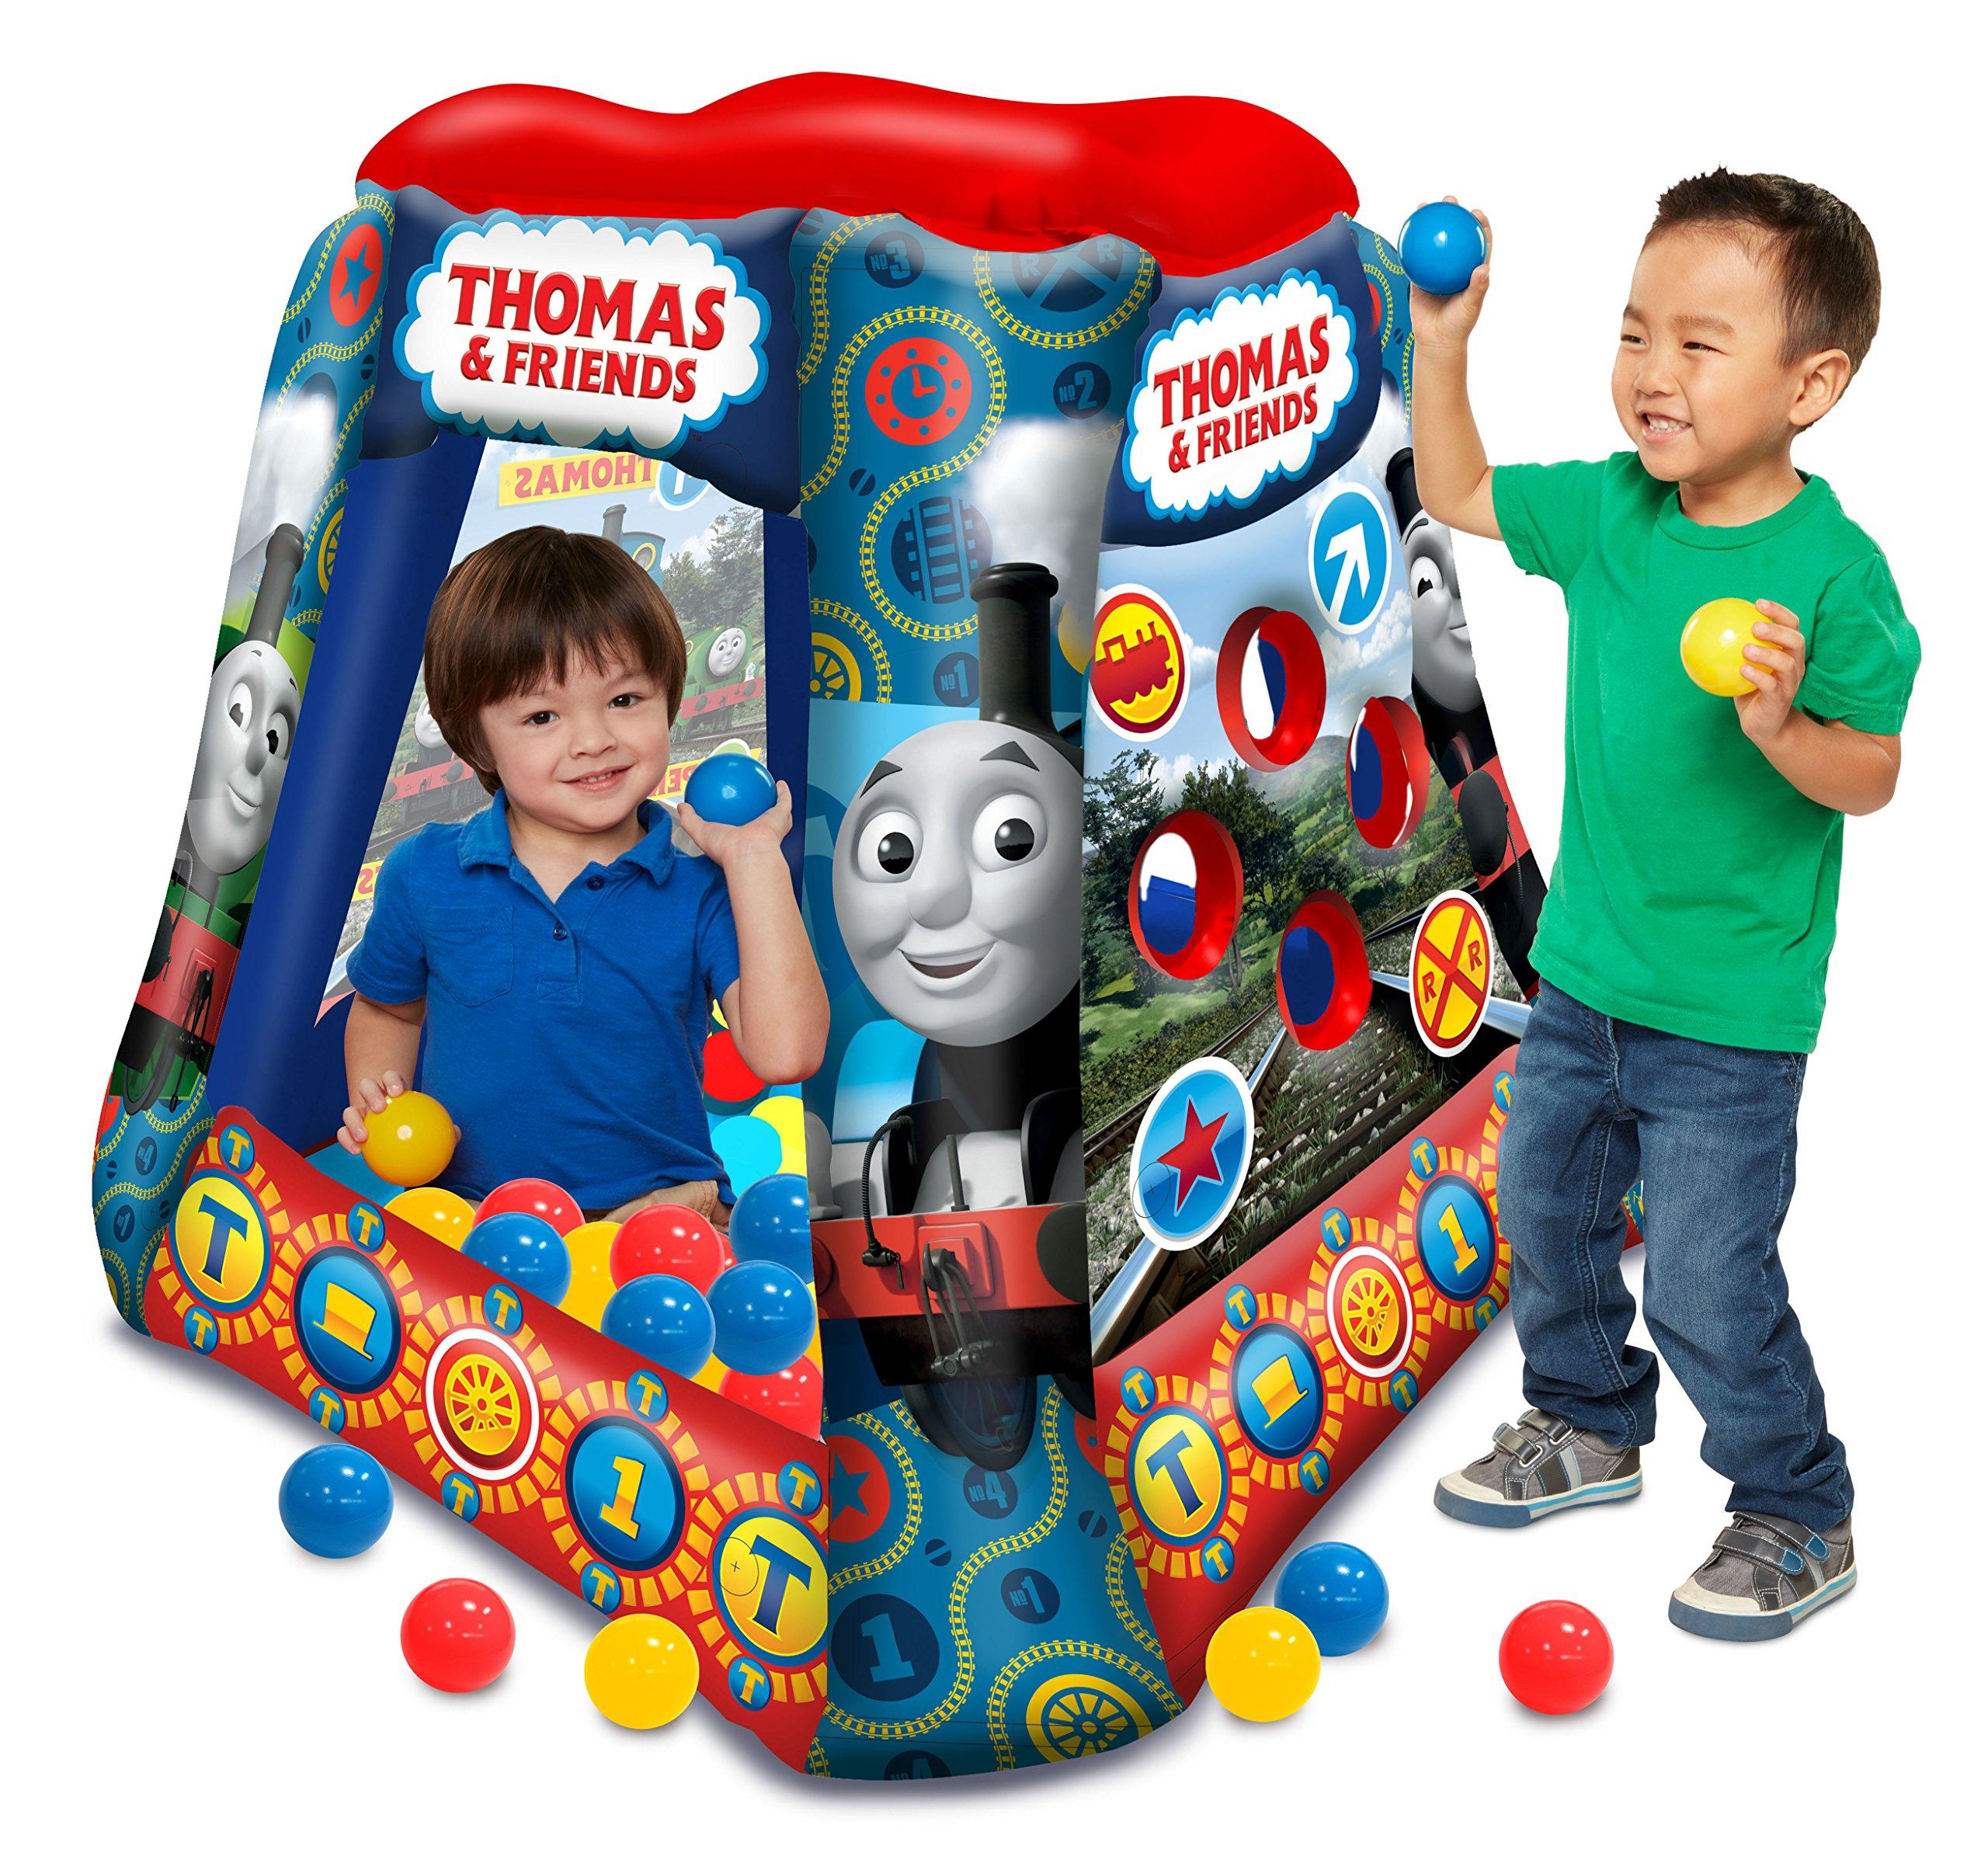 Thomas & Friends Ball Pit, 1 Inflatable & 20 Sof-Flex Balls, Blue/Red, 37''W x 37''D x 34''H